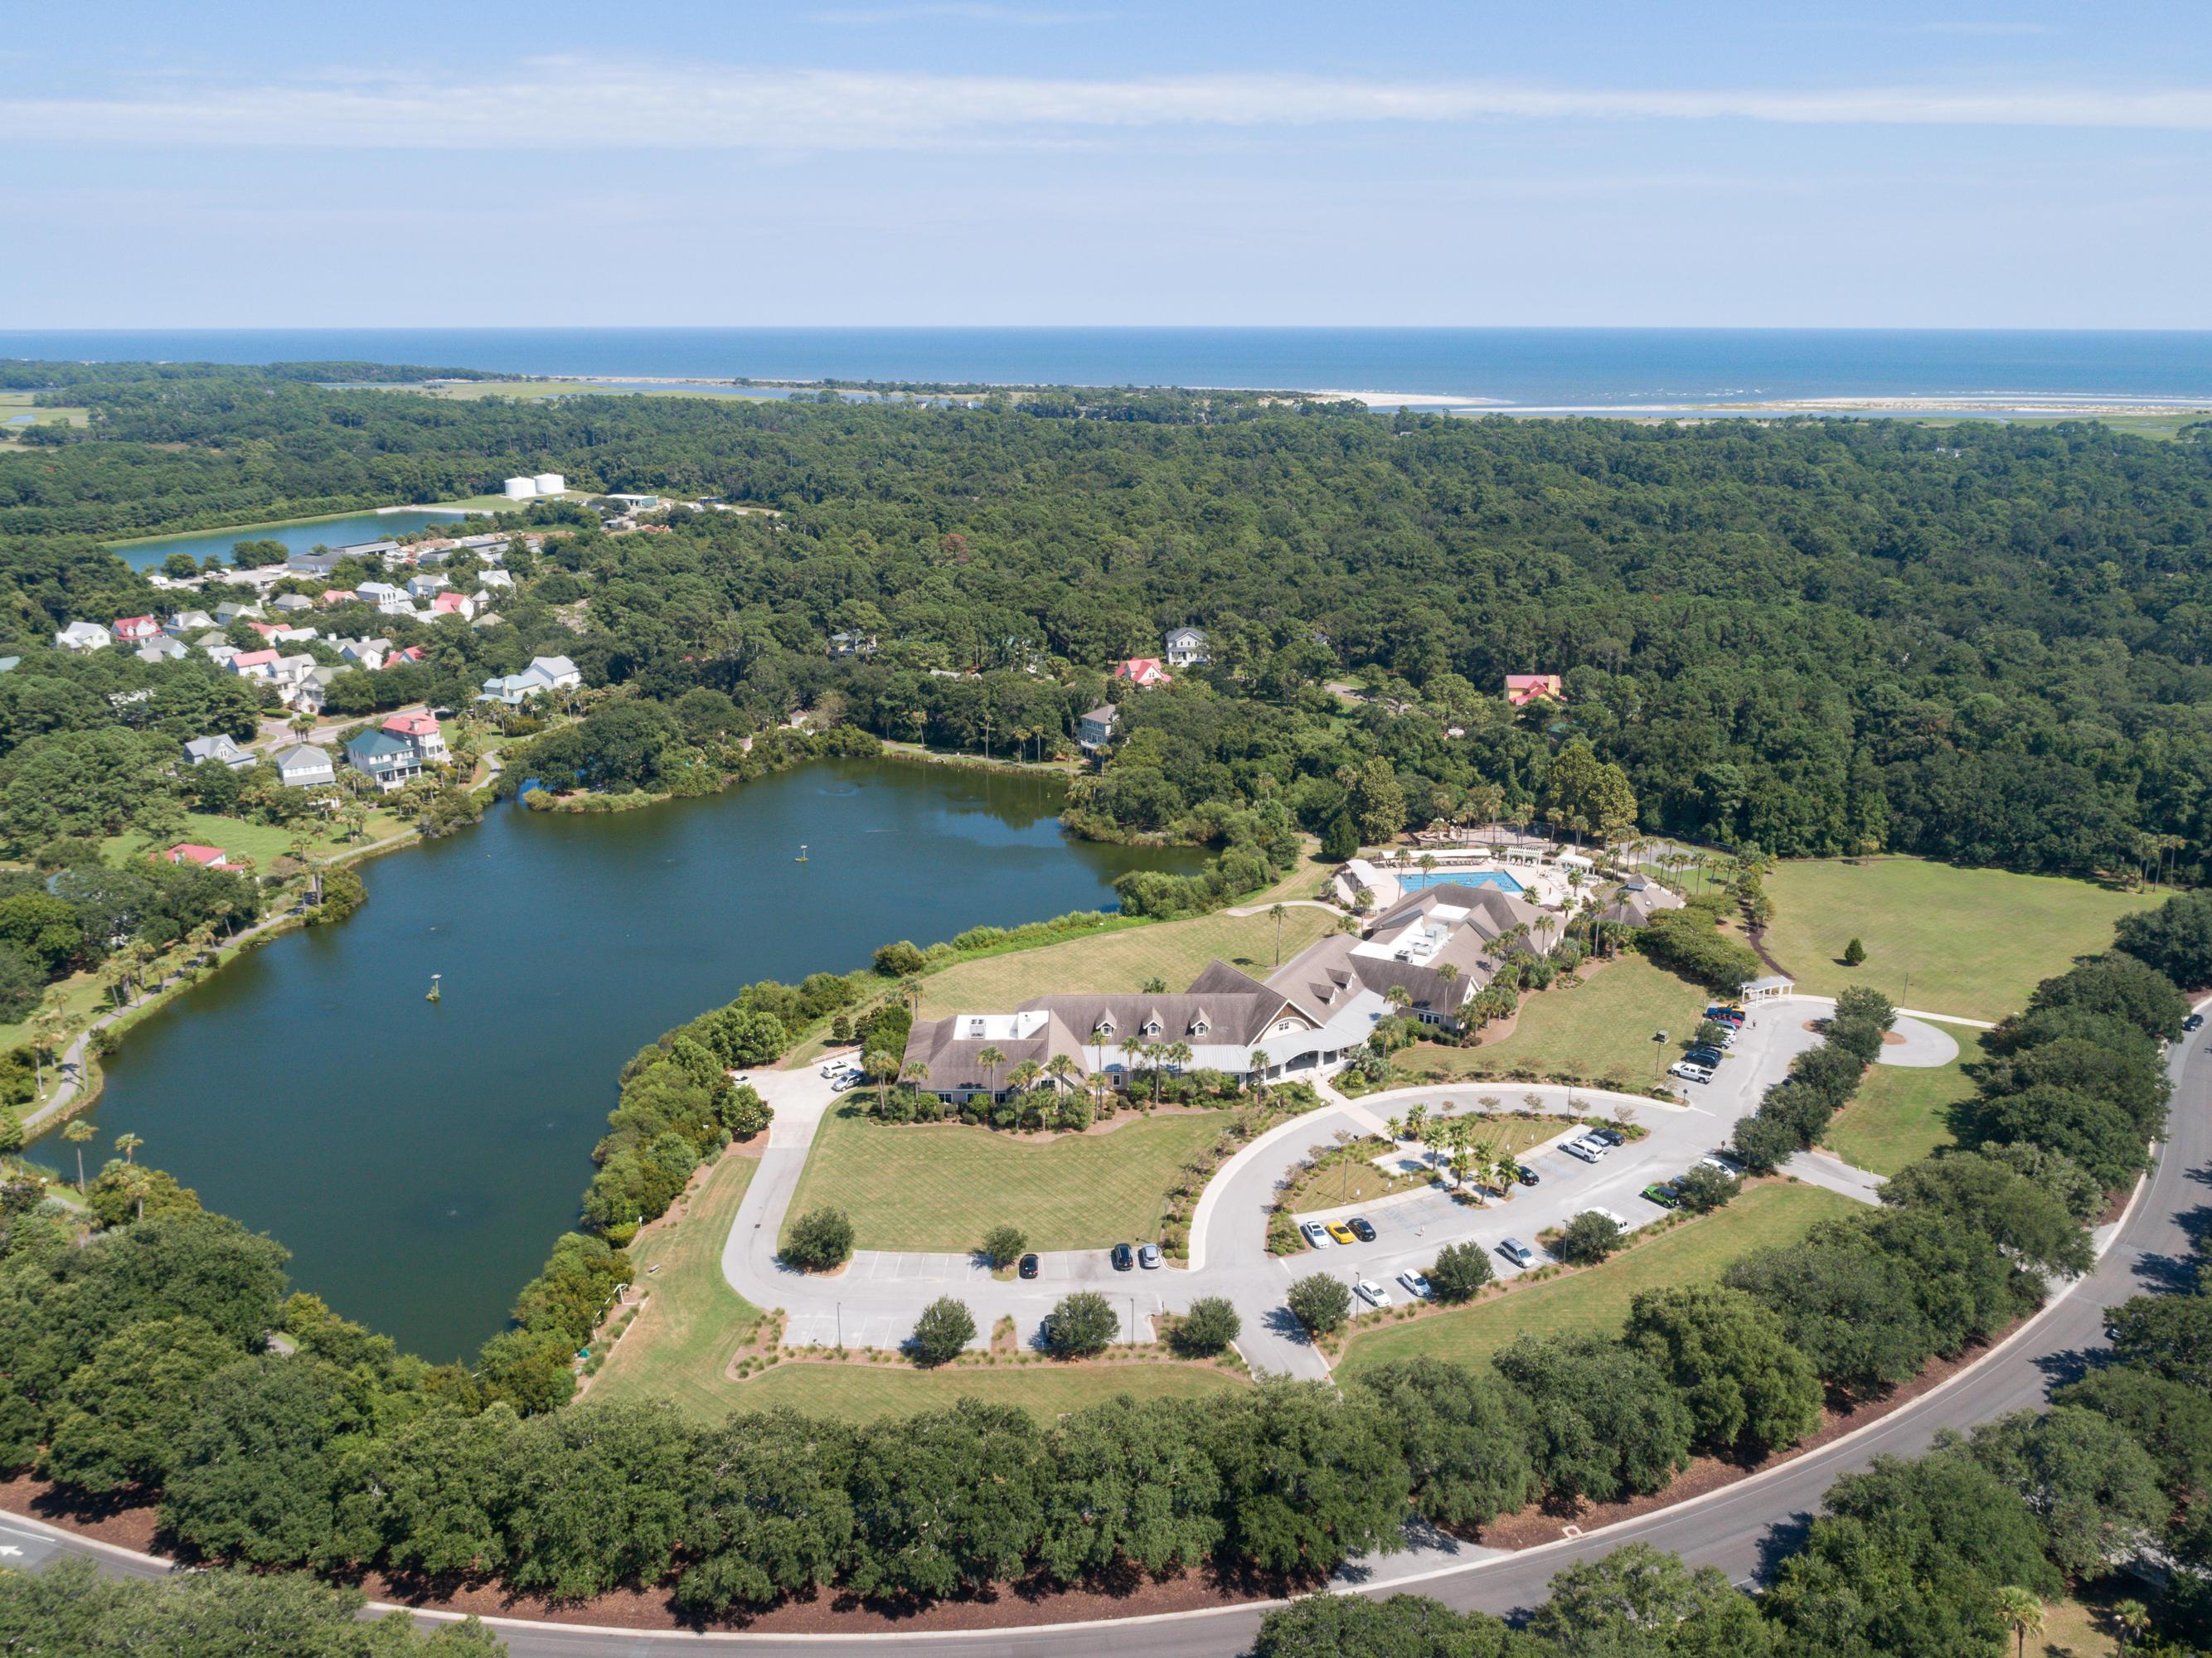 Seabrook Island Homes For Sale - 2909 Atrium Villa, Seabrook Island, SC - 0